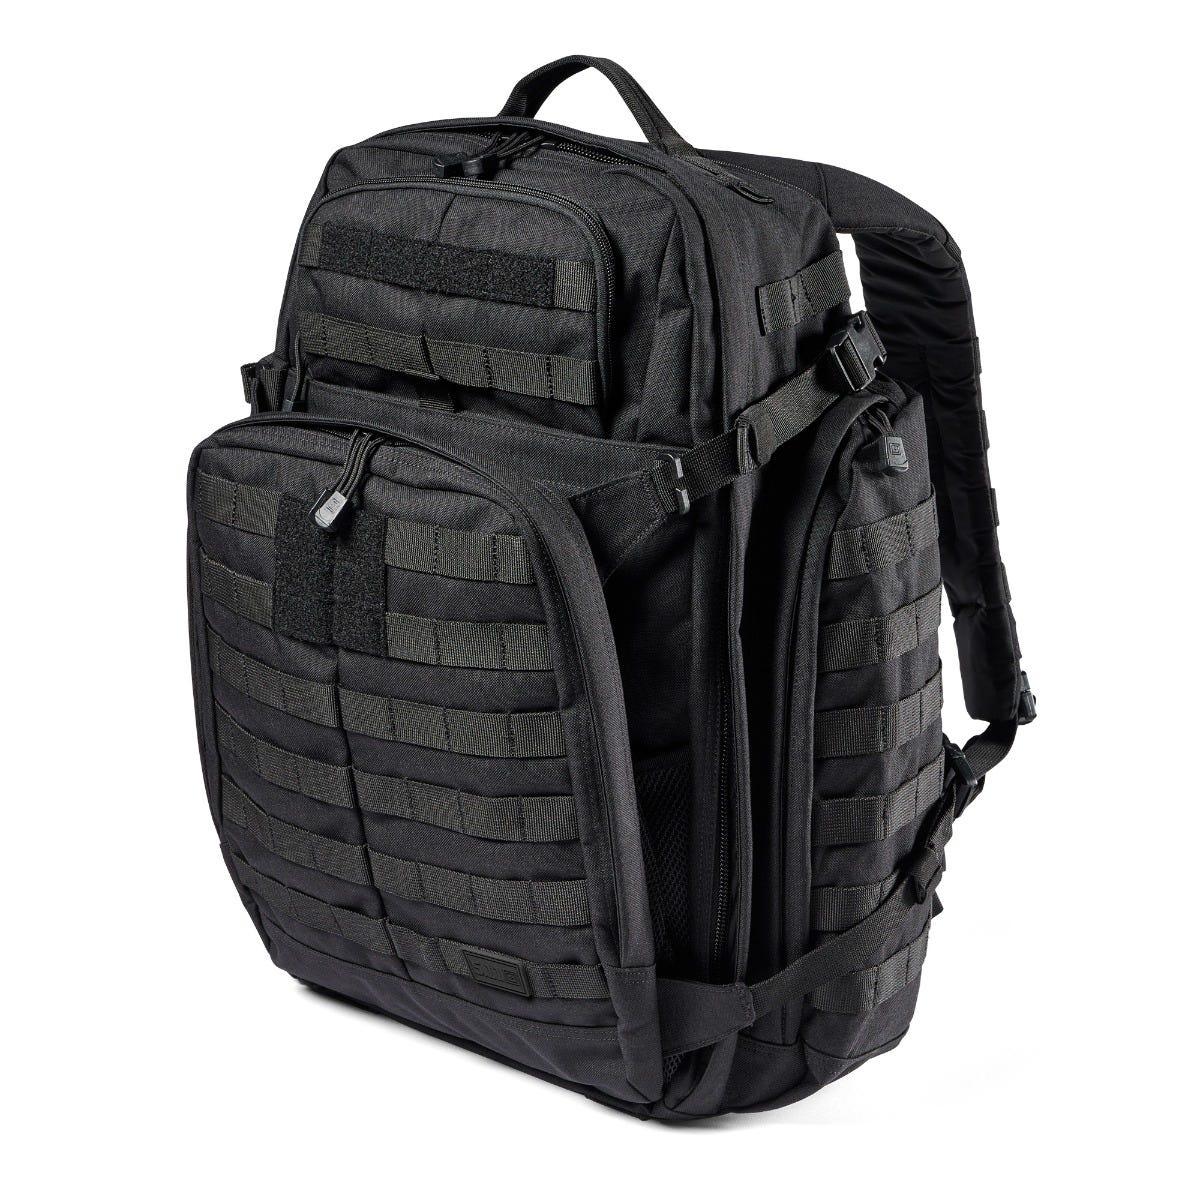 5.11 Militär Rucksack 45 L Rush 72 Molle System Armeerucksack Backpack sand